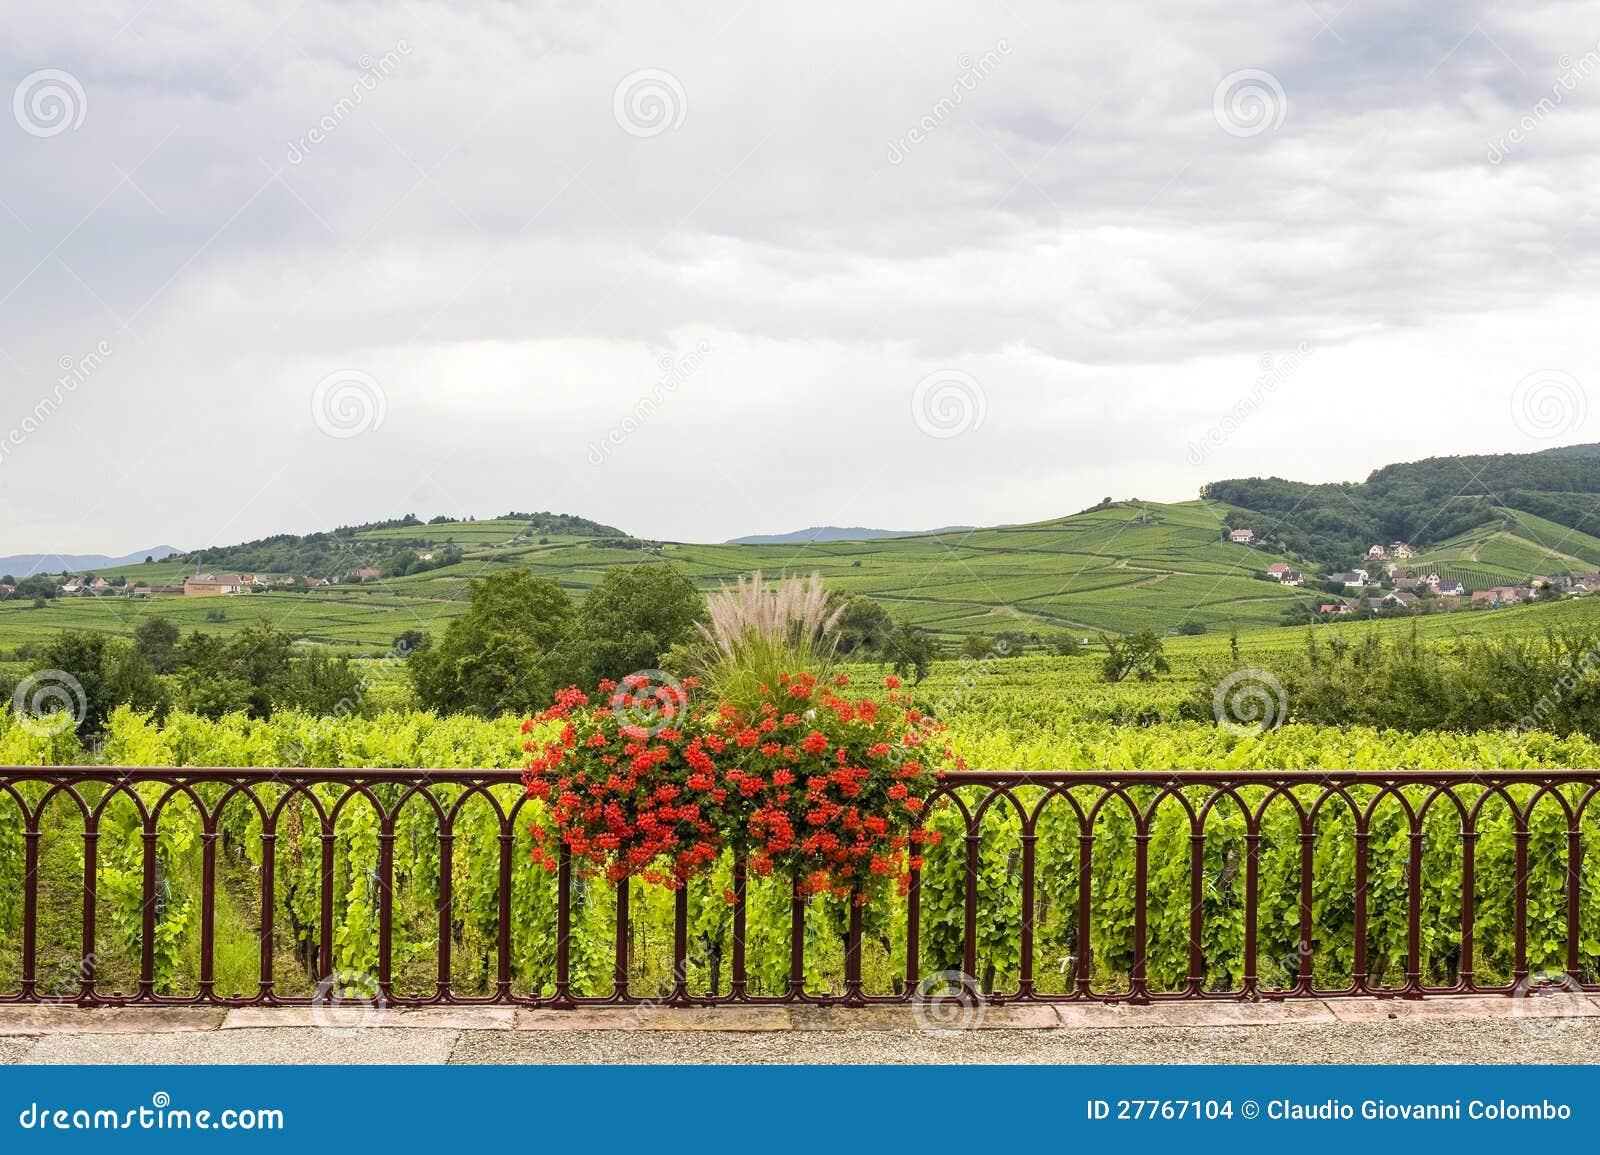 Saint-Hippolyte (Alsace) - horizontal